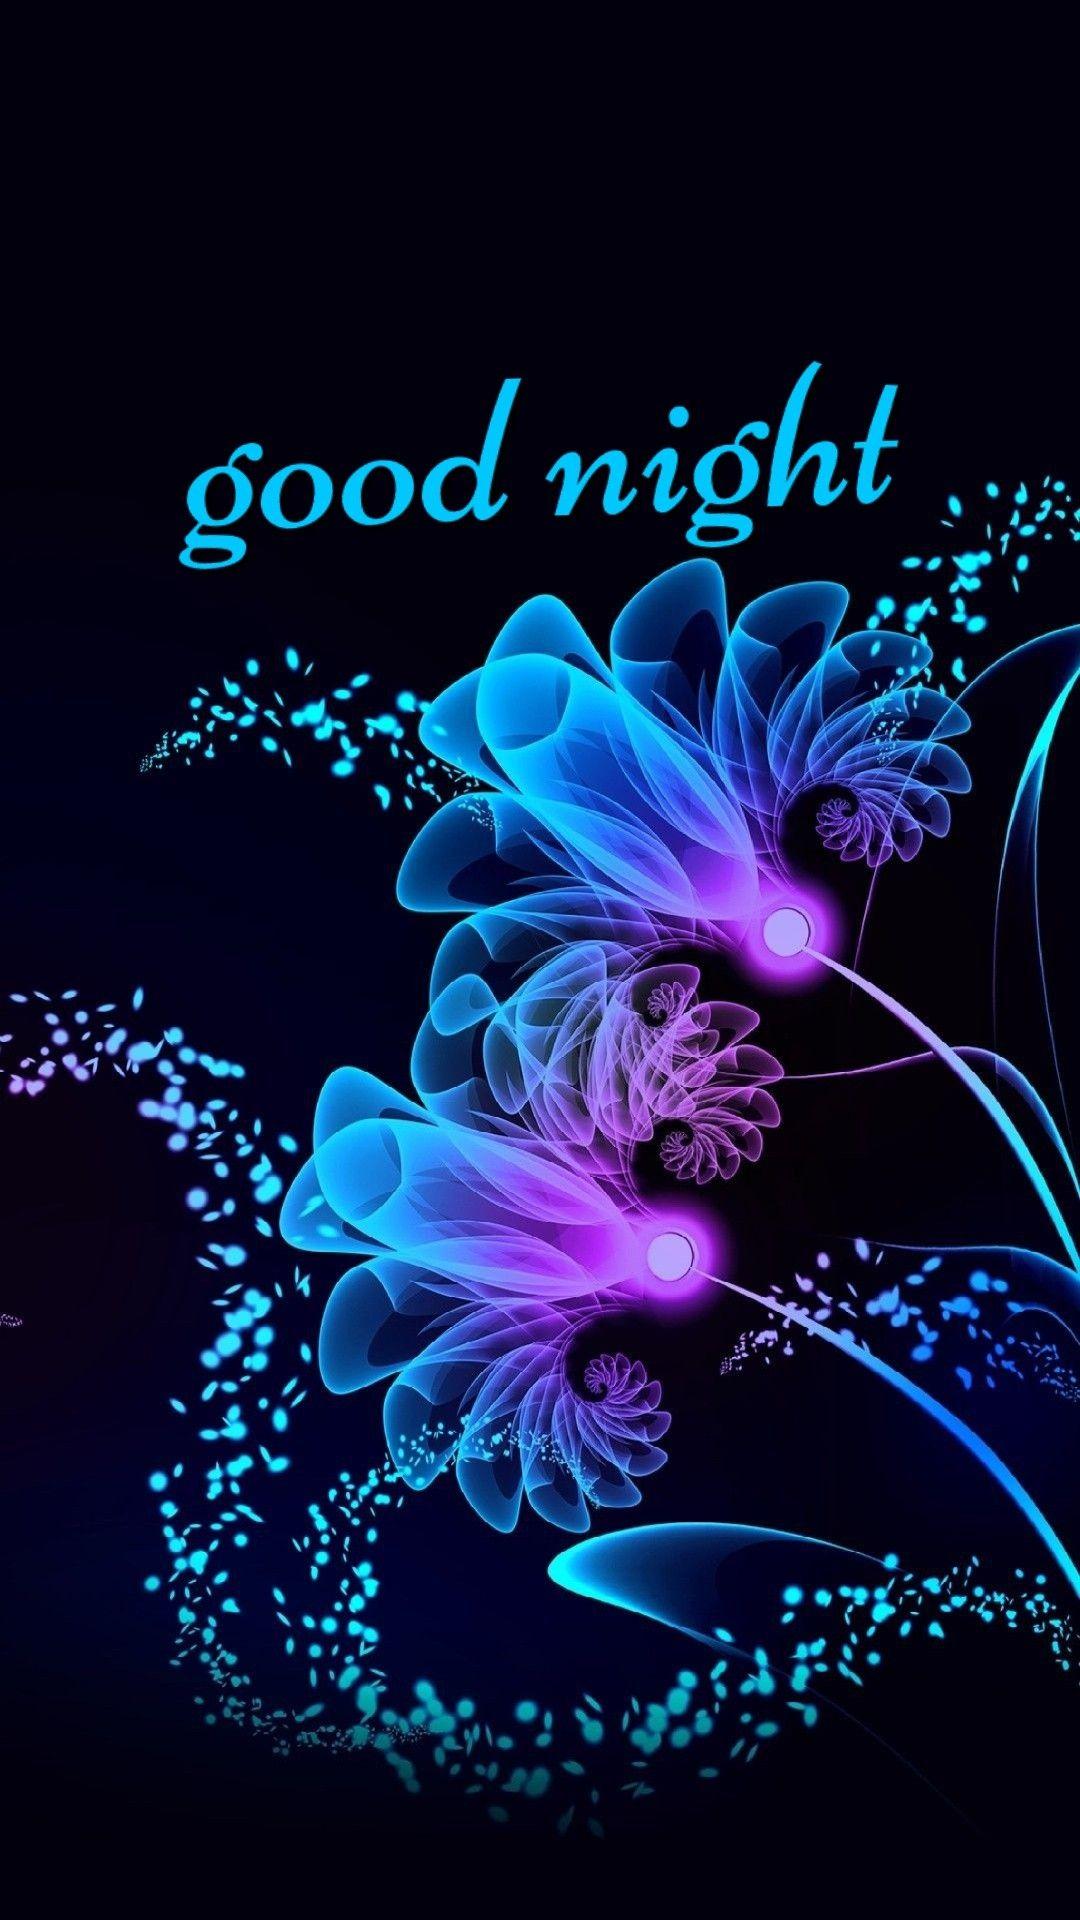 Pin By Marylwhite On Good Night Flower Art Good Night Greetings Good Night Image